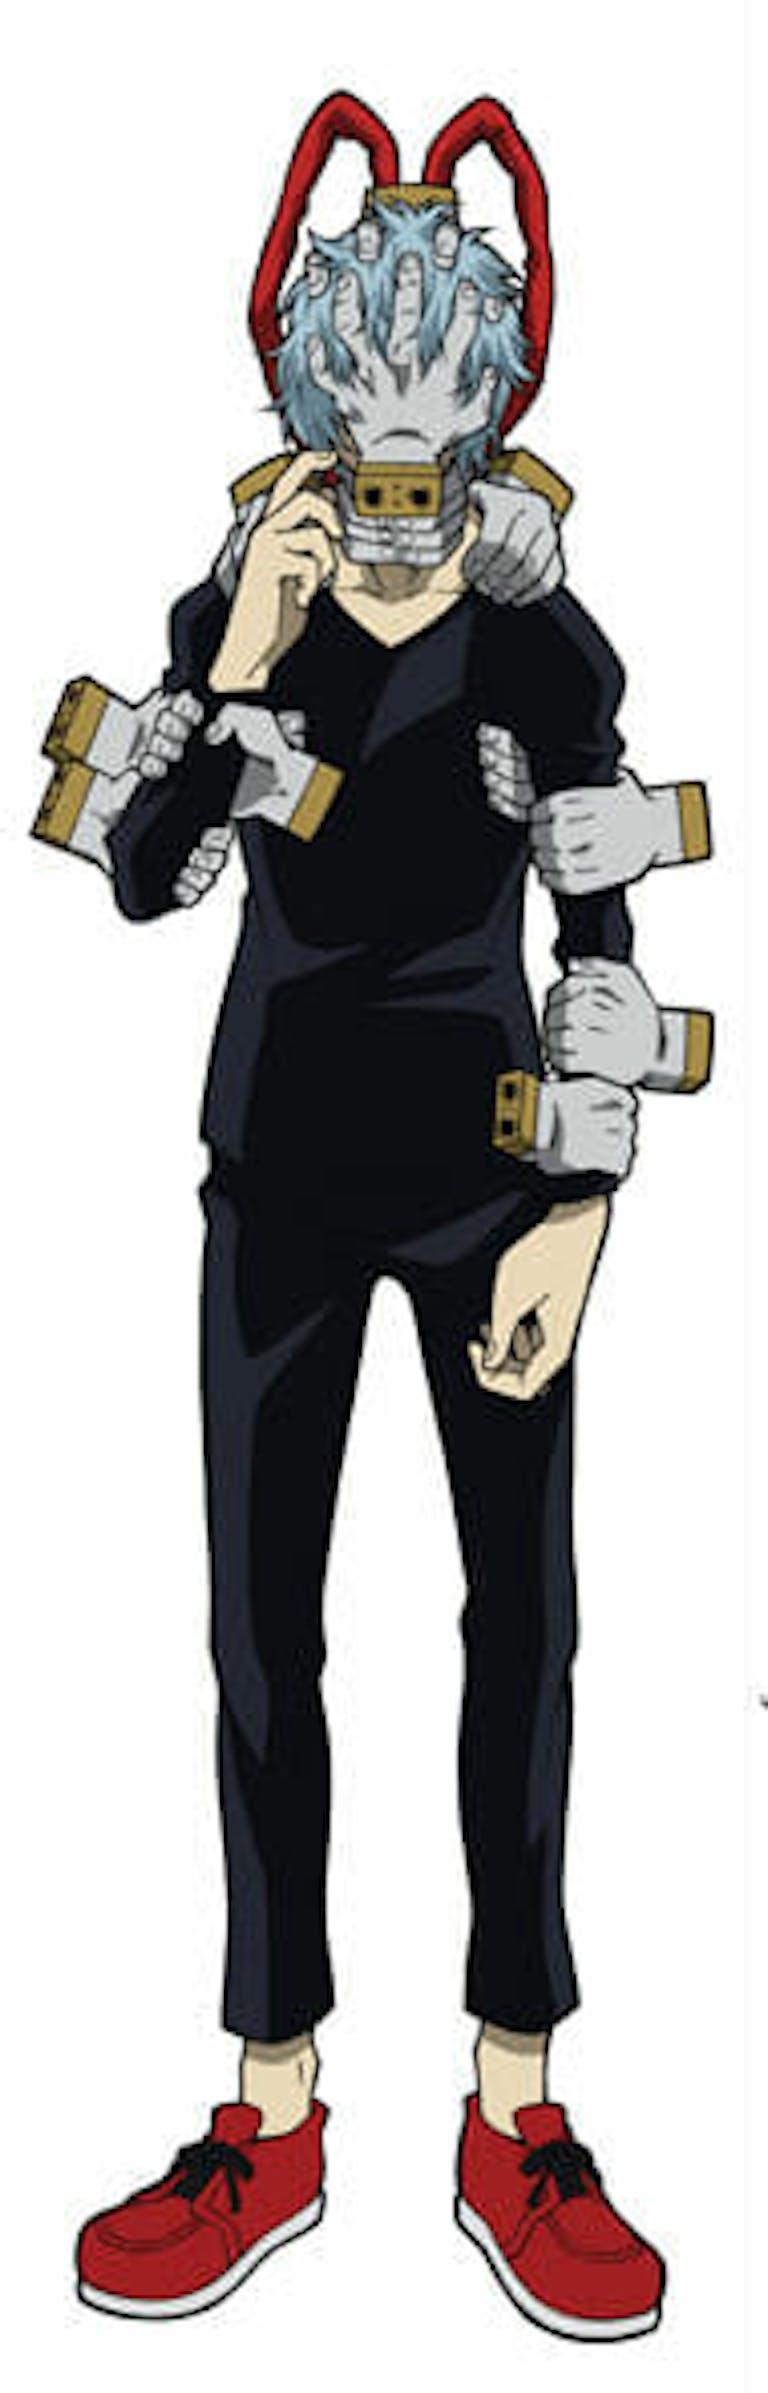 boku no hero academia characters : shigaraki